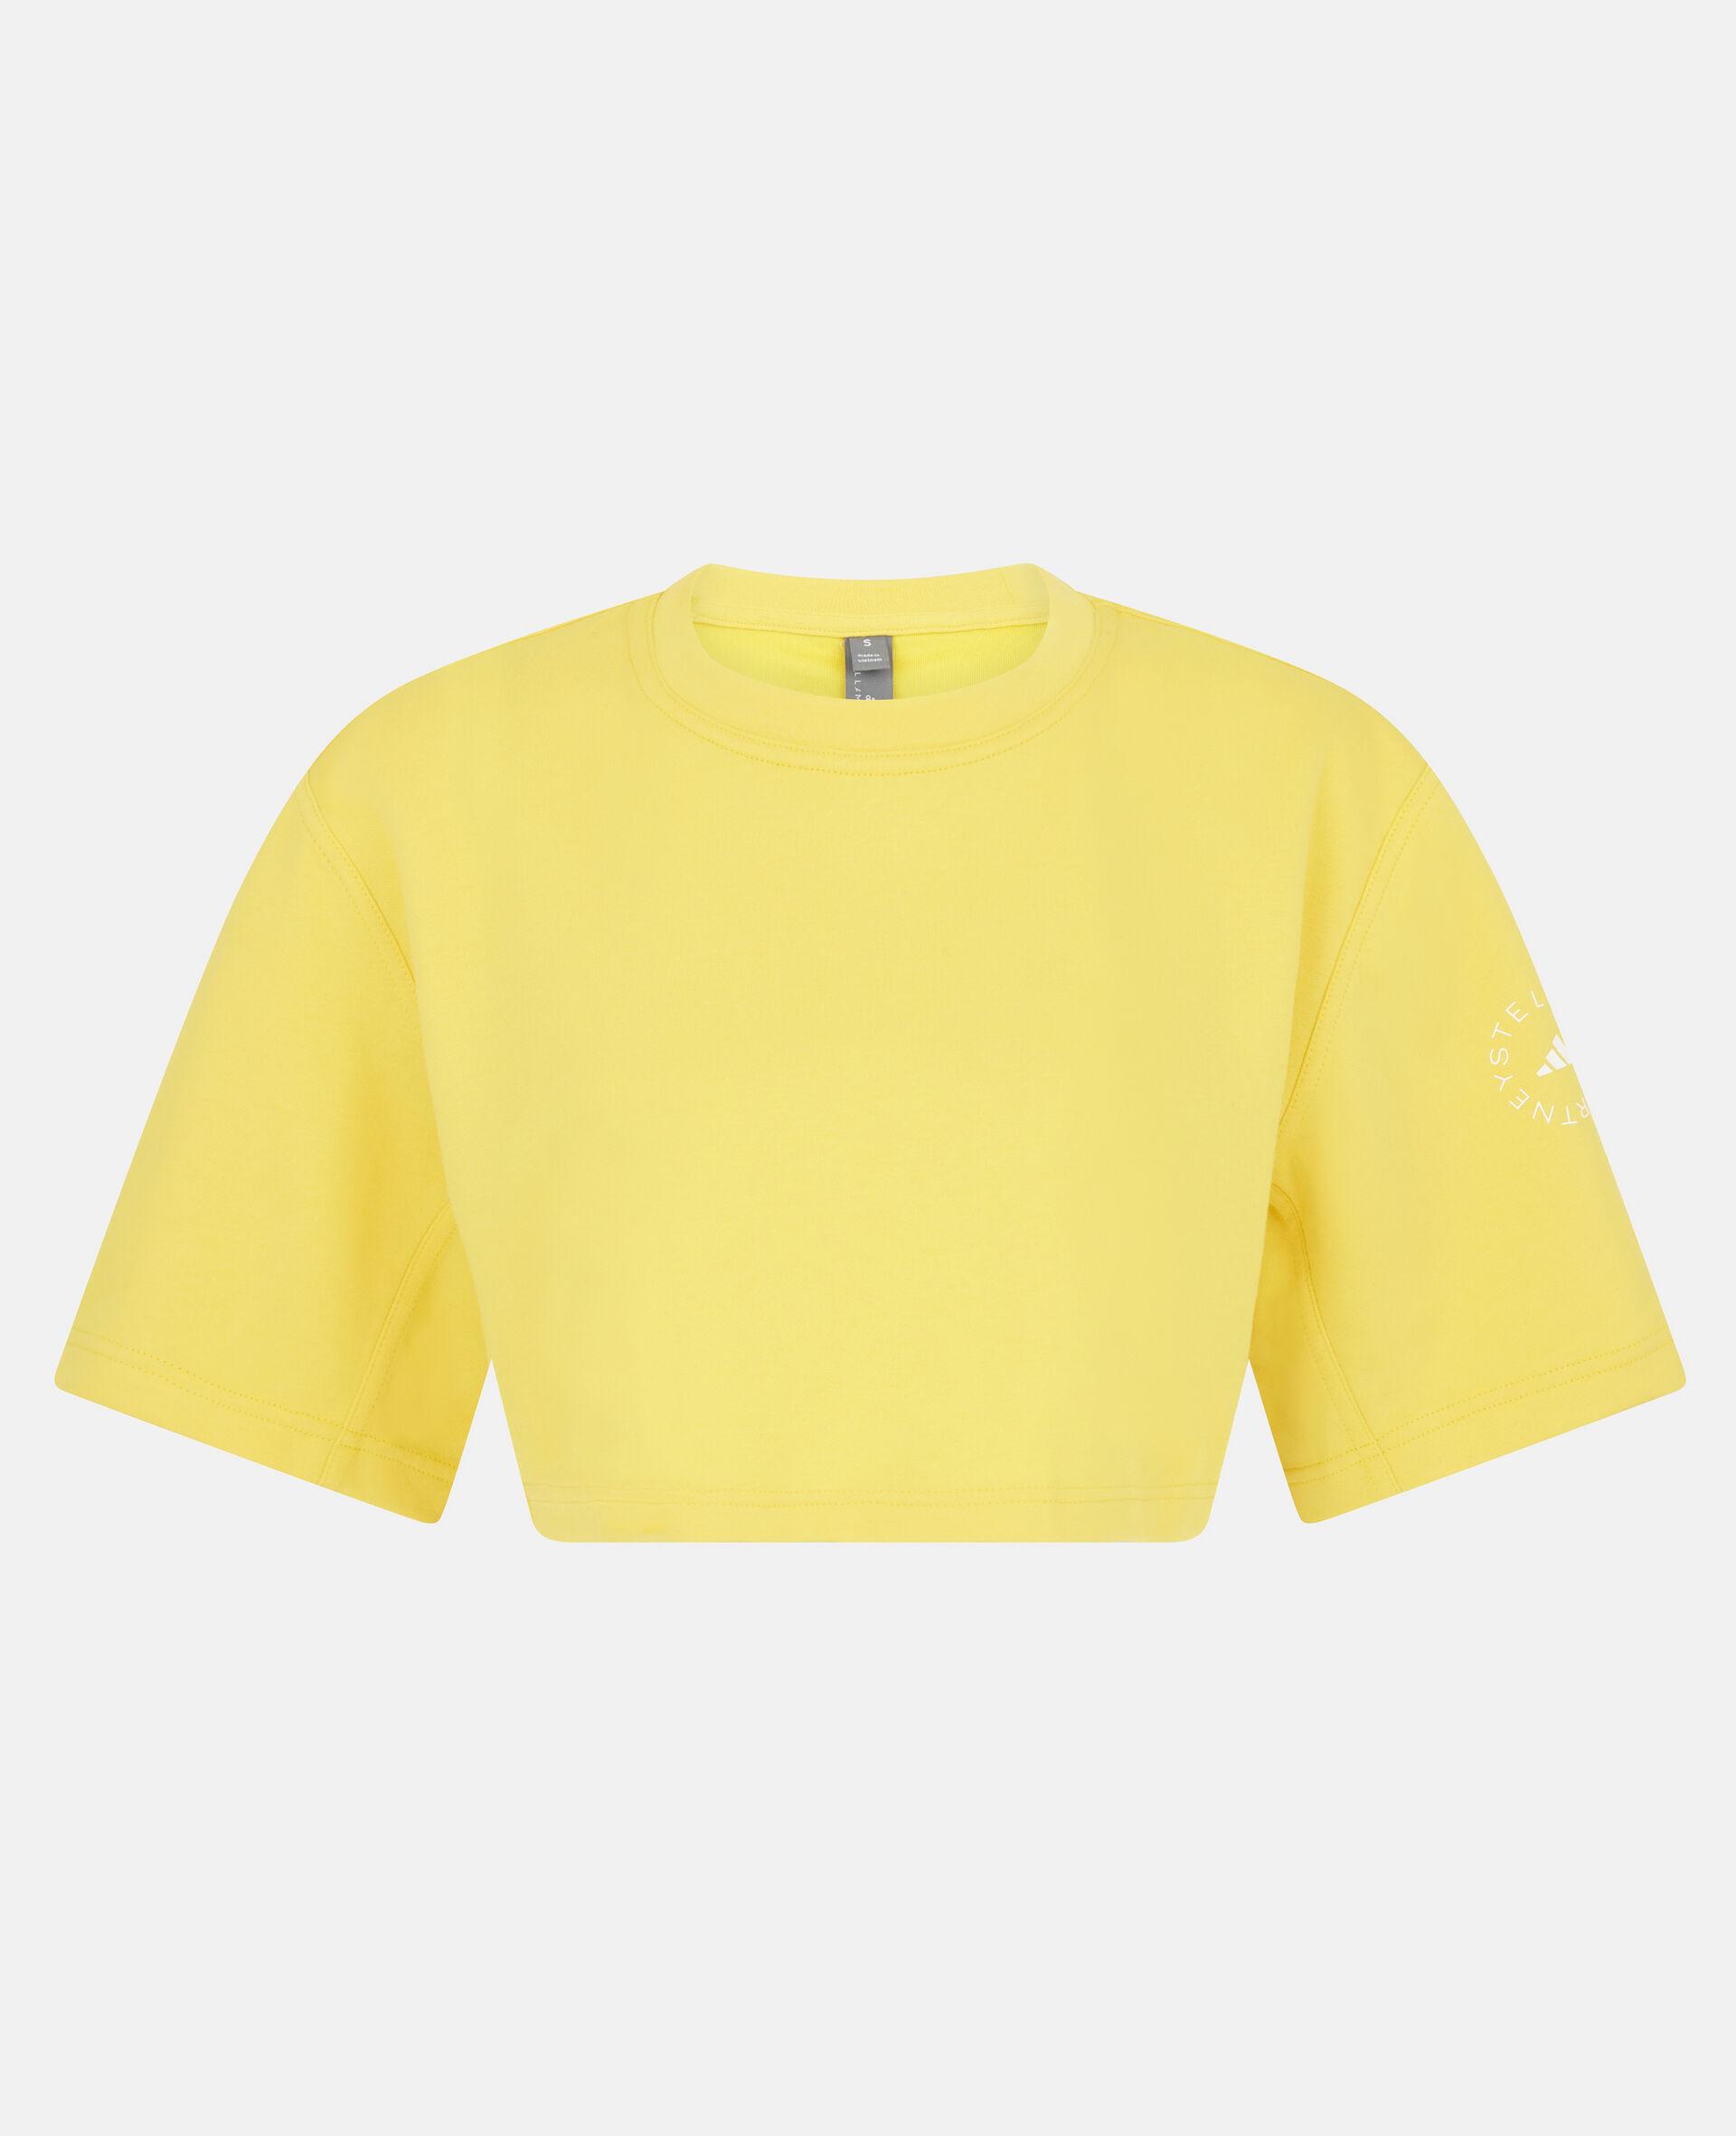 T-shirt crop d'entraînement jaune-Jaune-large image number 0